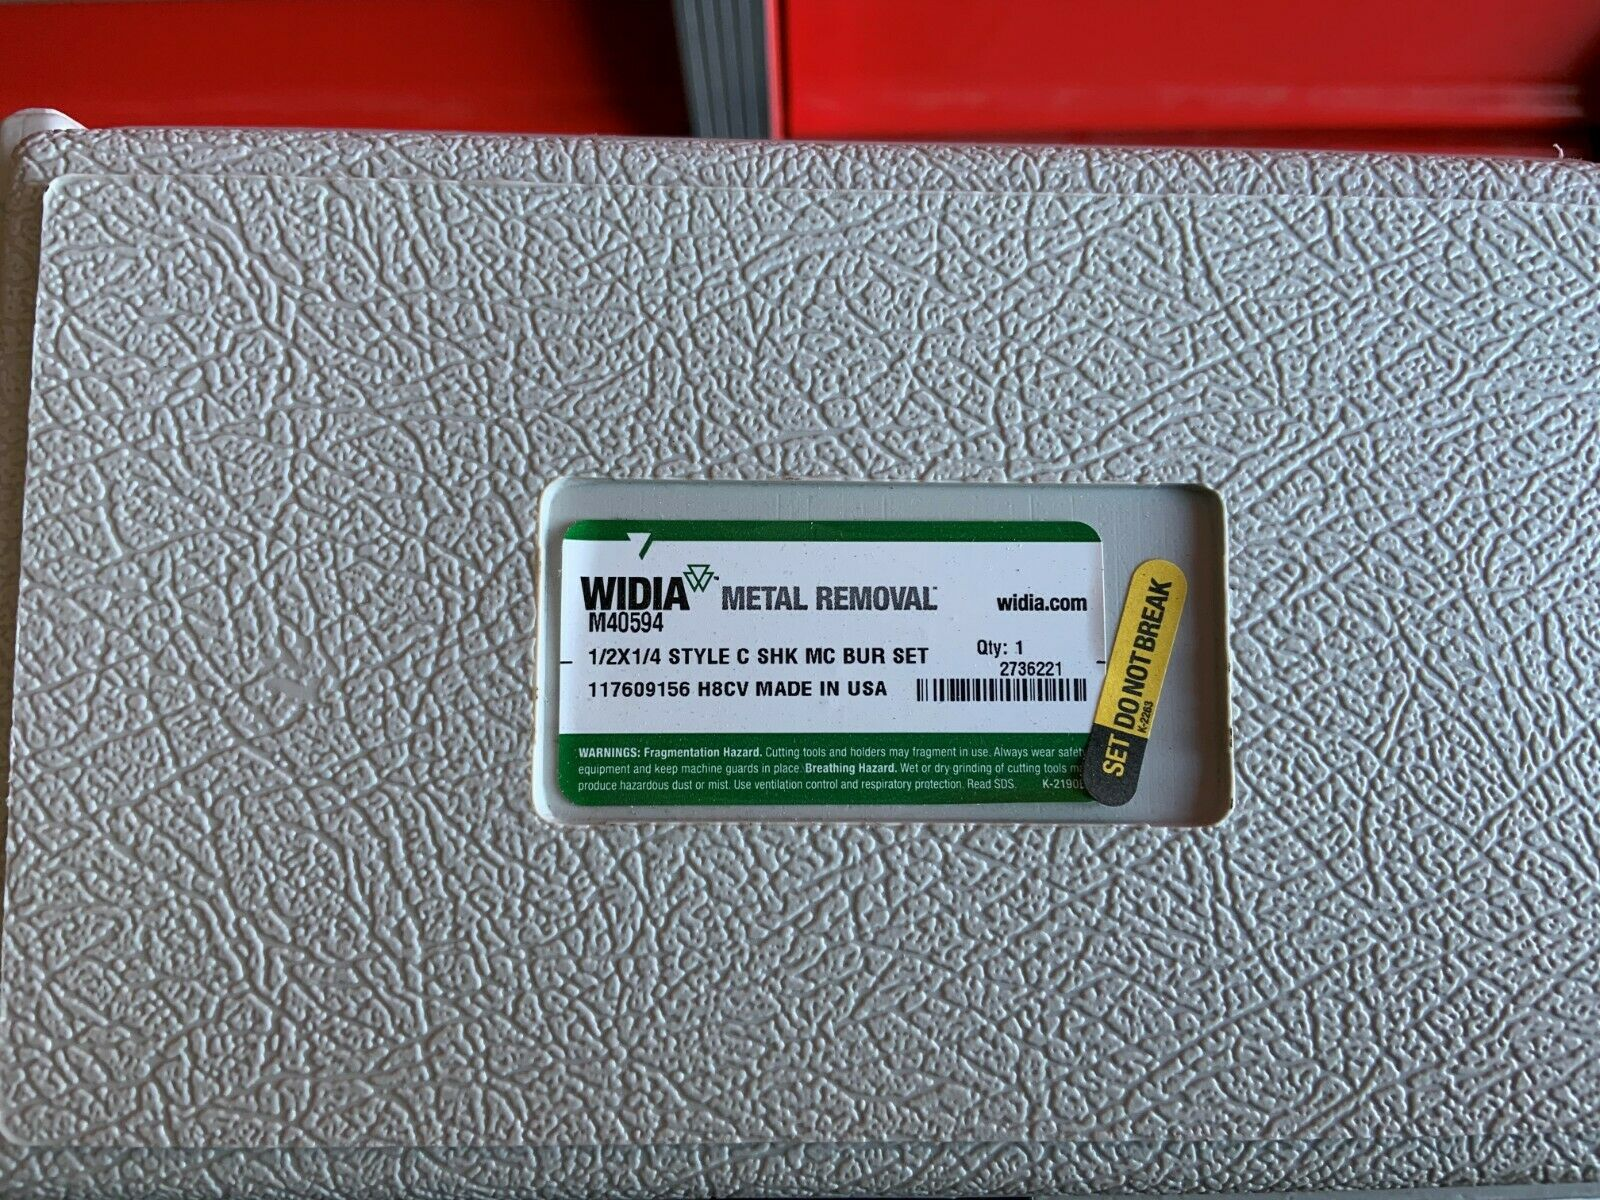 WIDIA METAL REMOVAL M40594 Carbide Bur Sets,1//2,8 Pcs